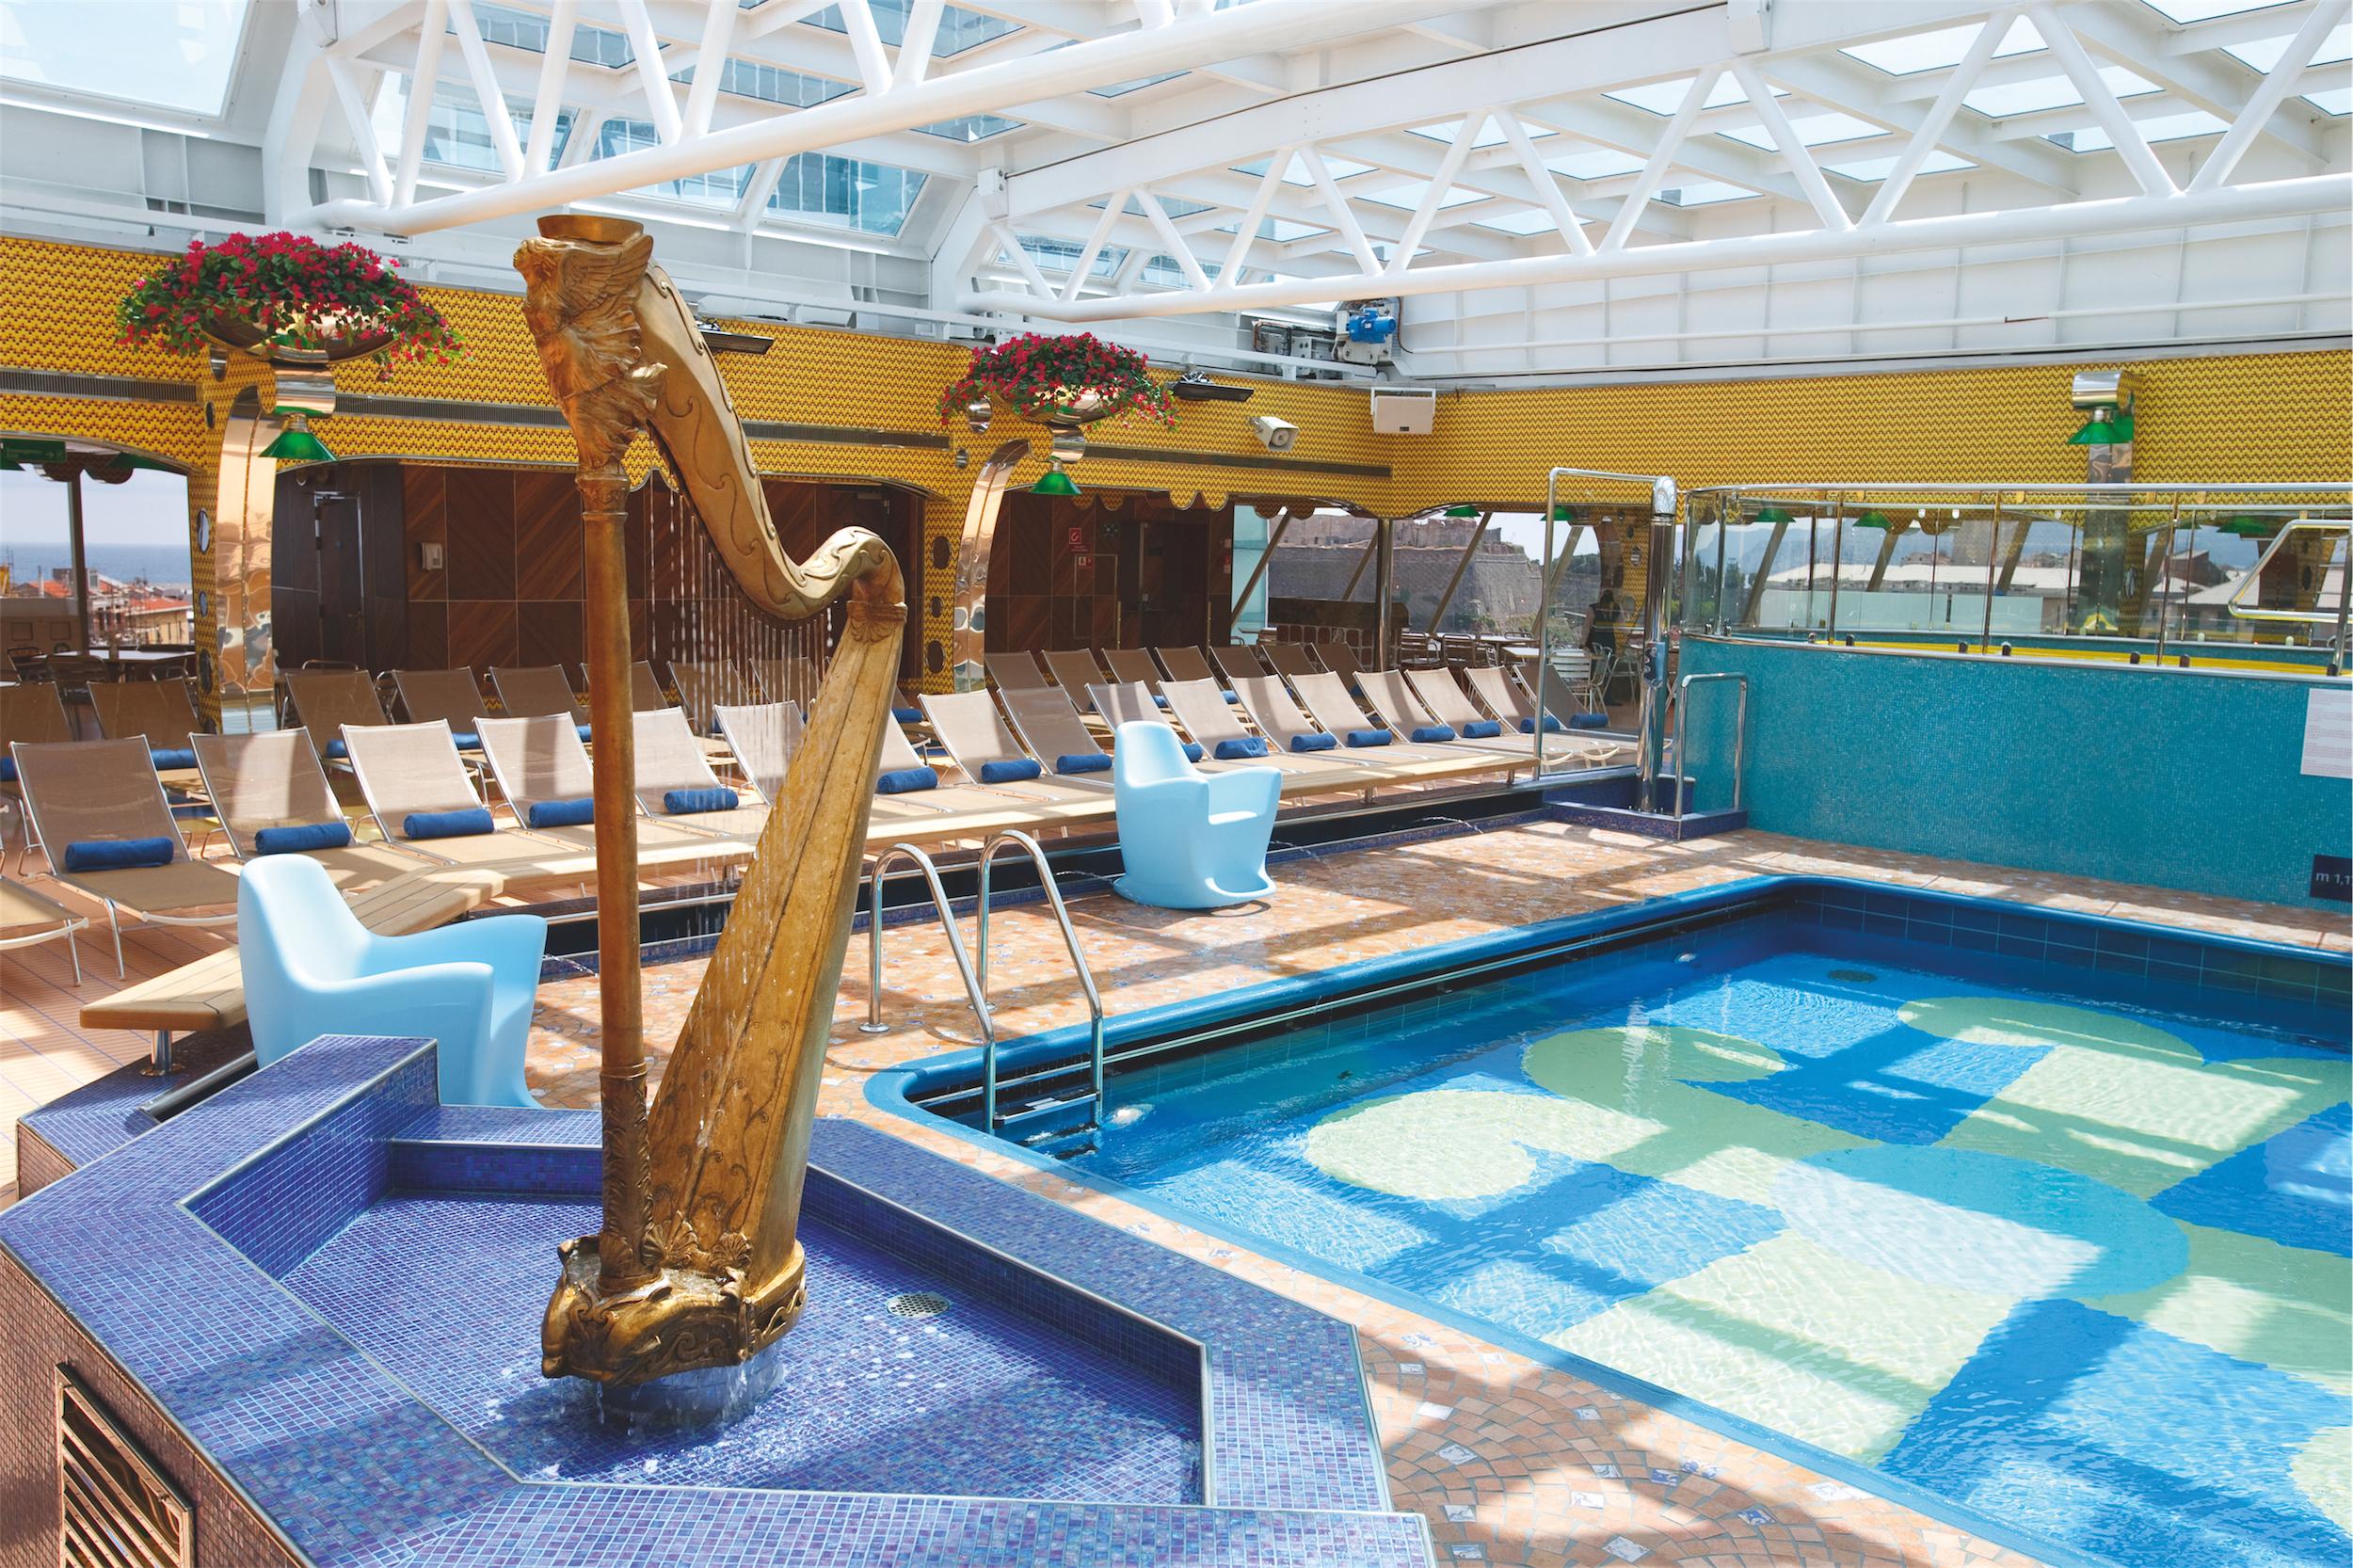 Costa Cruises Costa Pacifica Exterior Swimming Pool 4.JPG